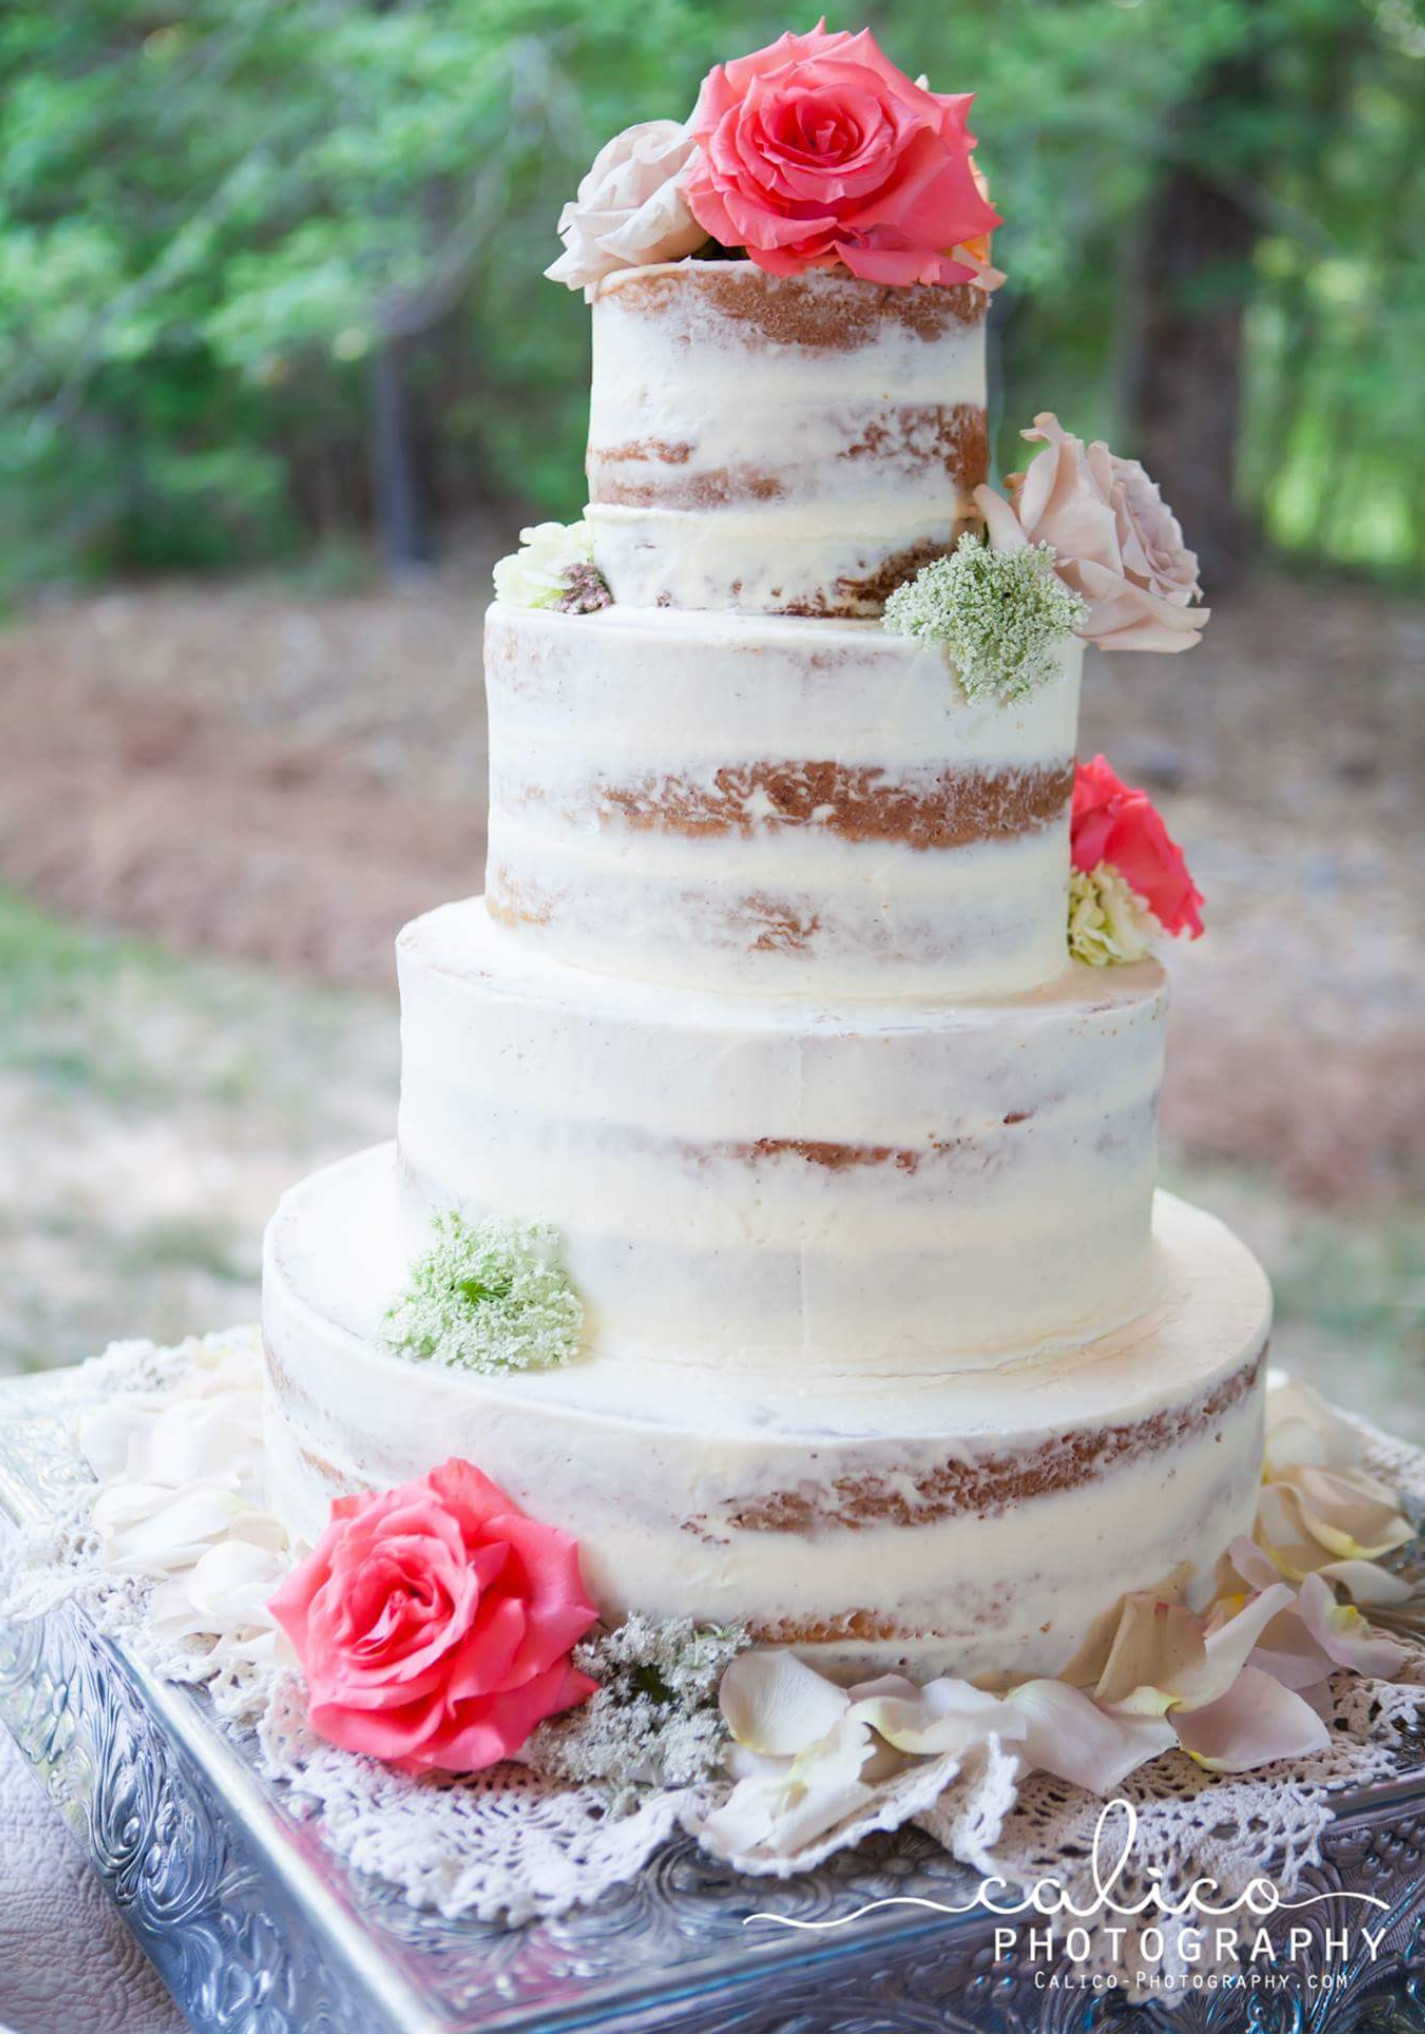 Wedding Cakes Columbia Sc  Wedding Cakes Columbia Sc